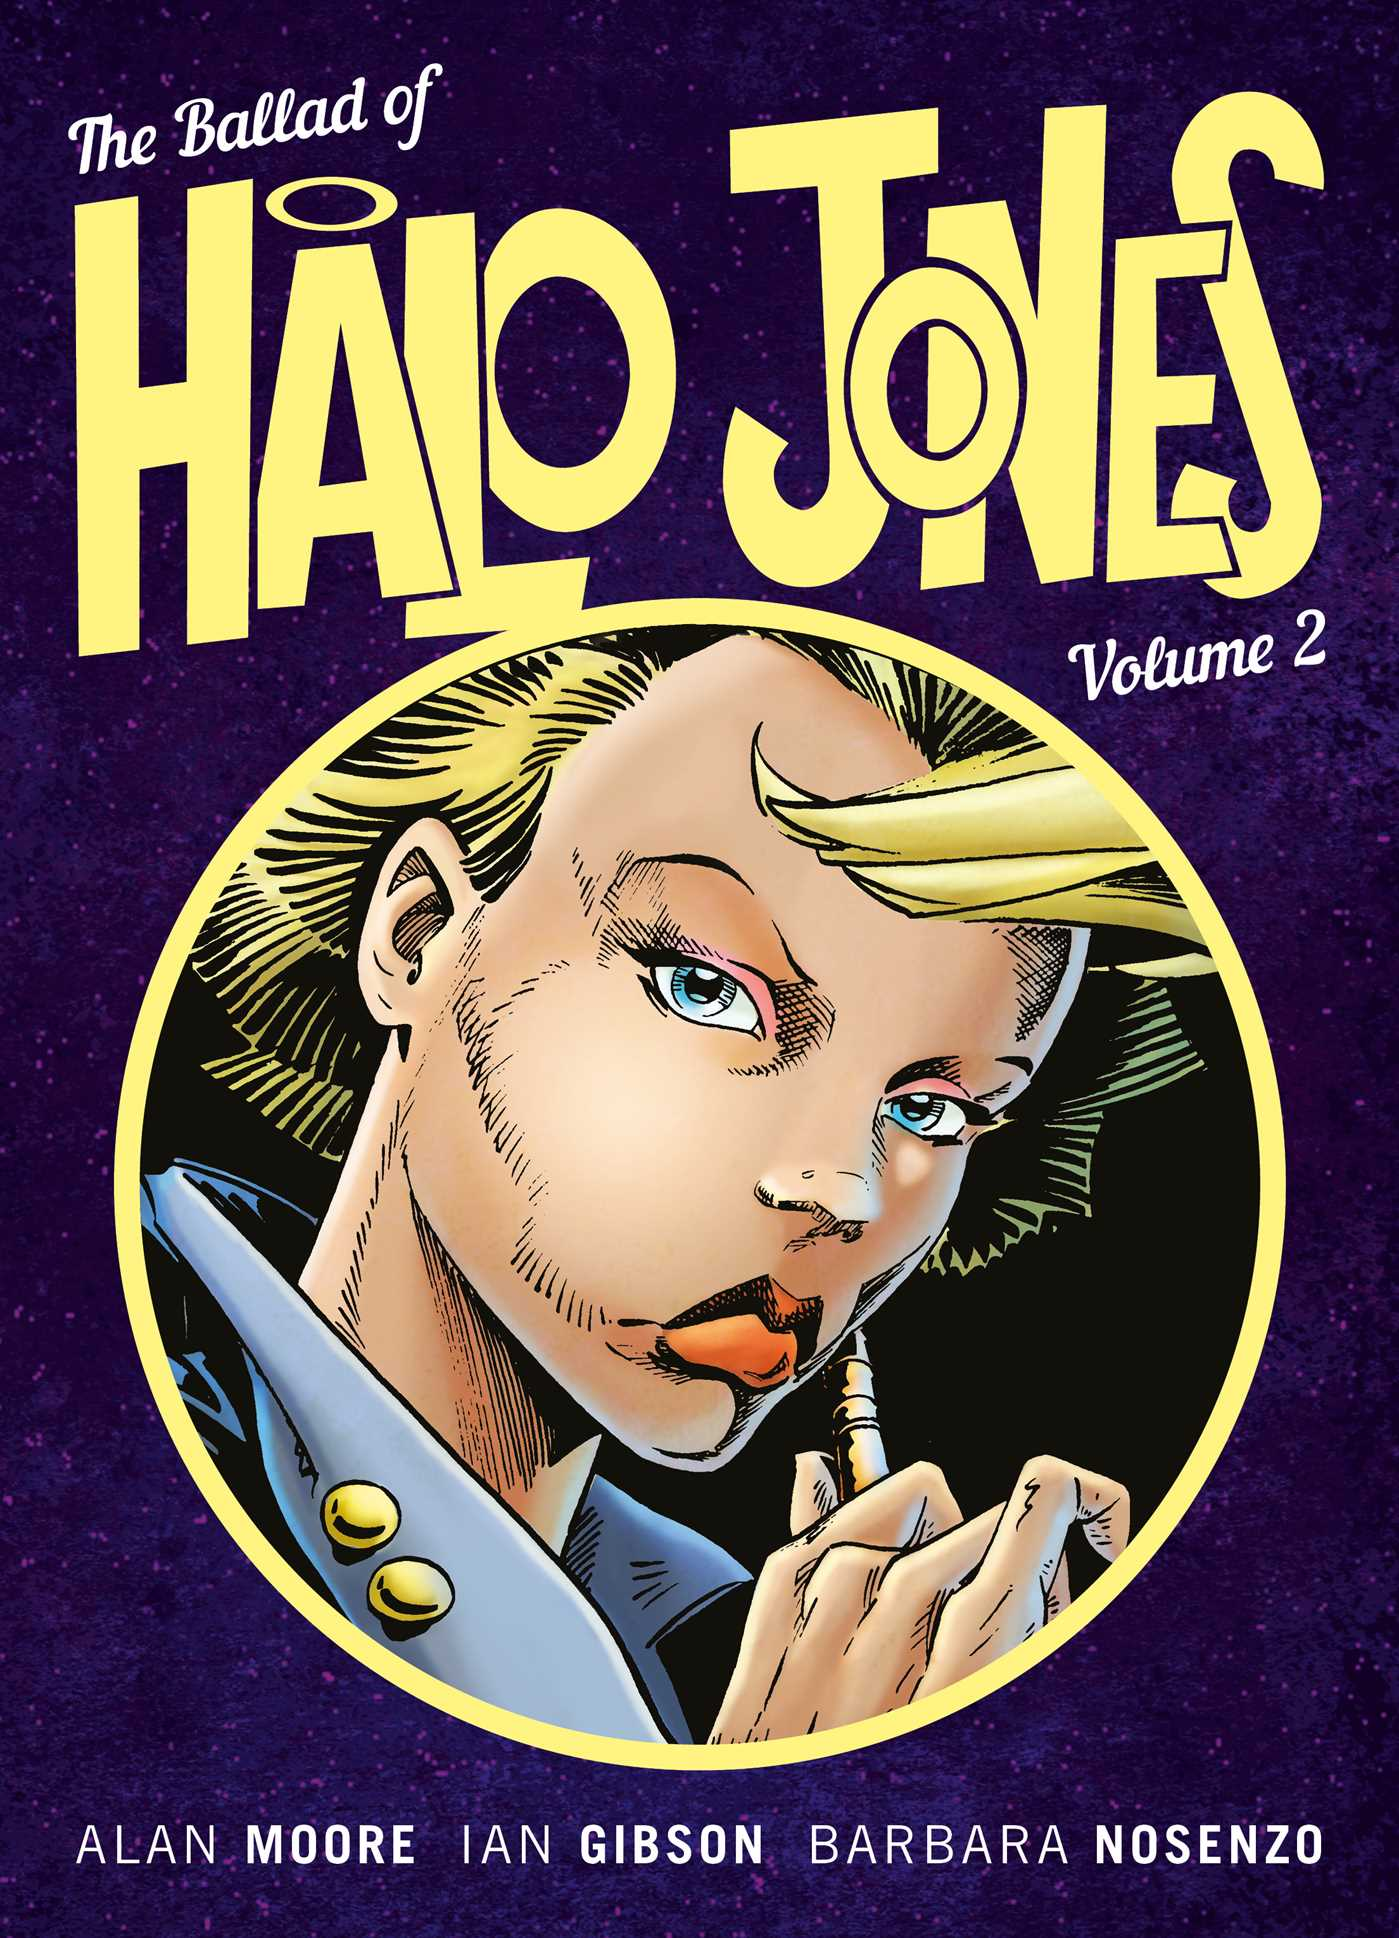 The ballad of halo jones volume 2 9781781086360 hr